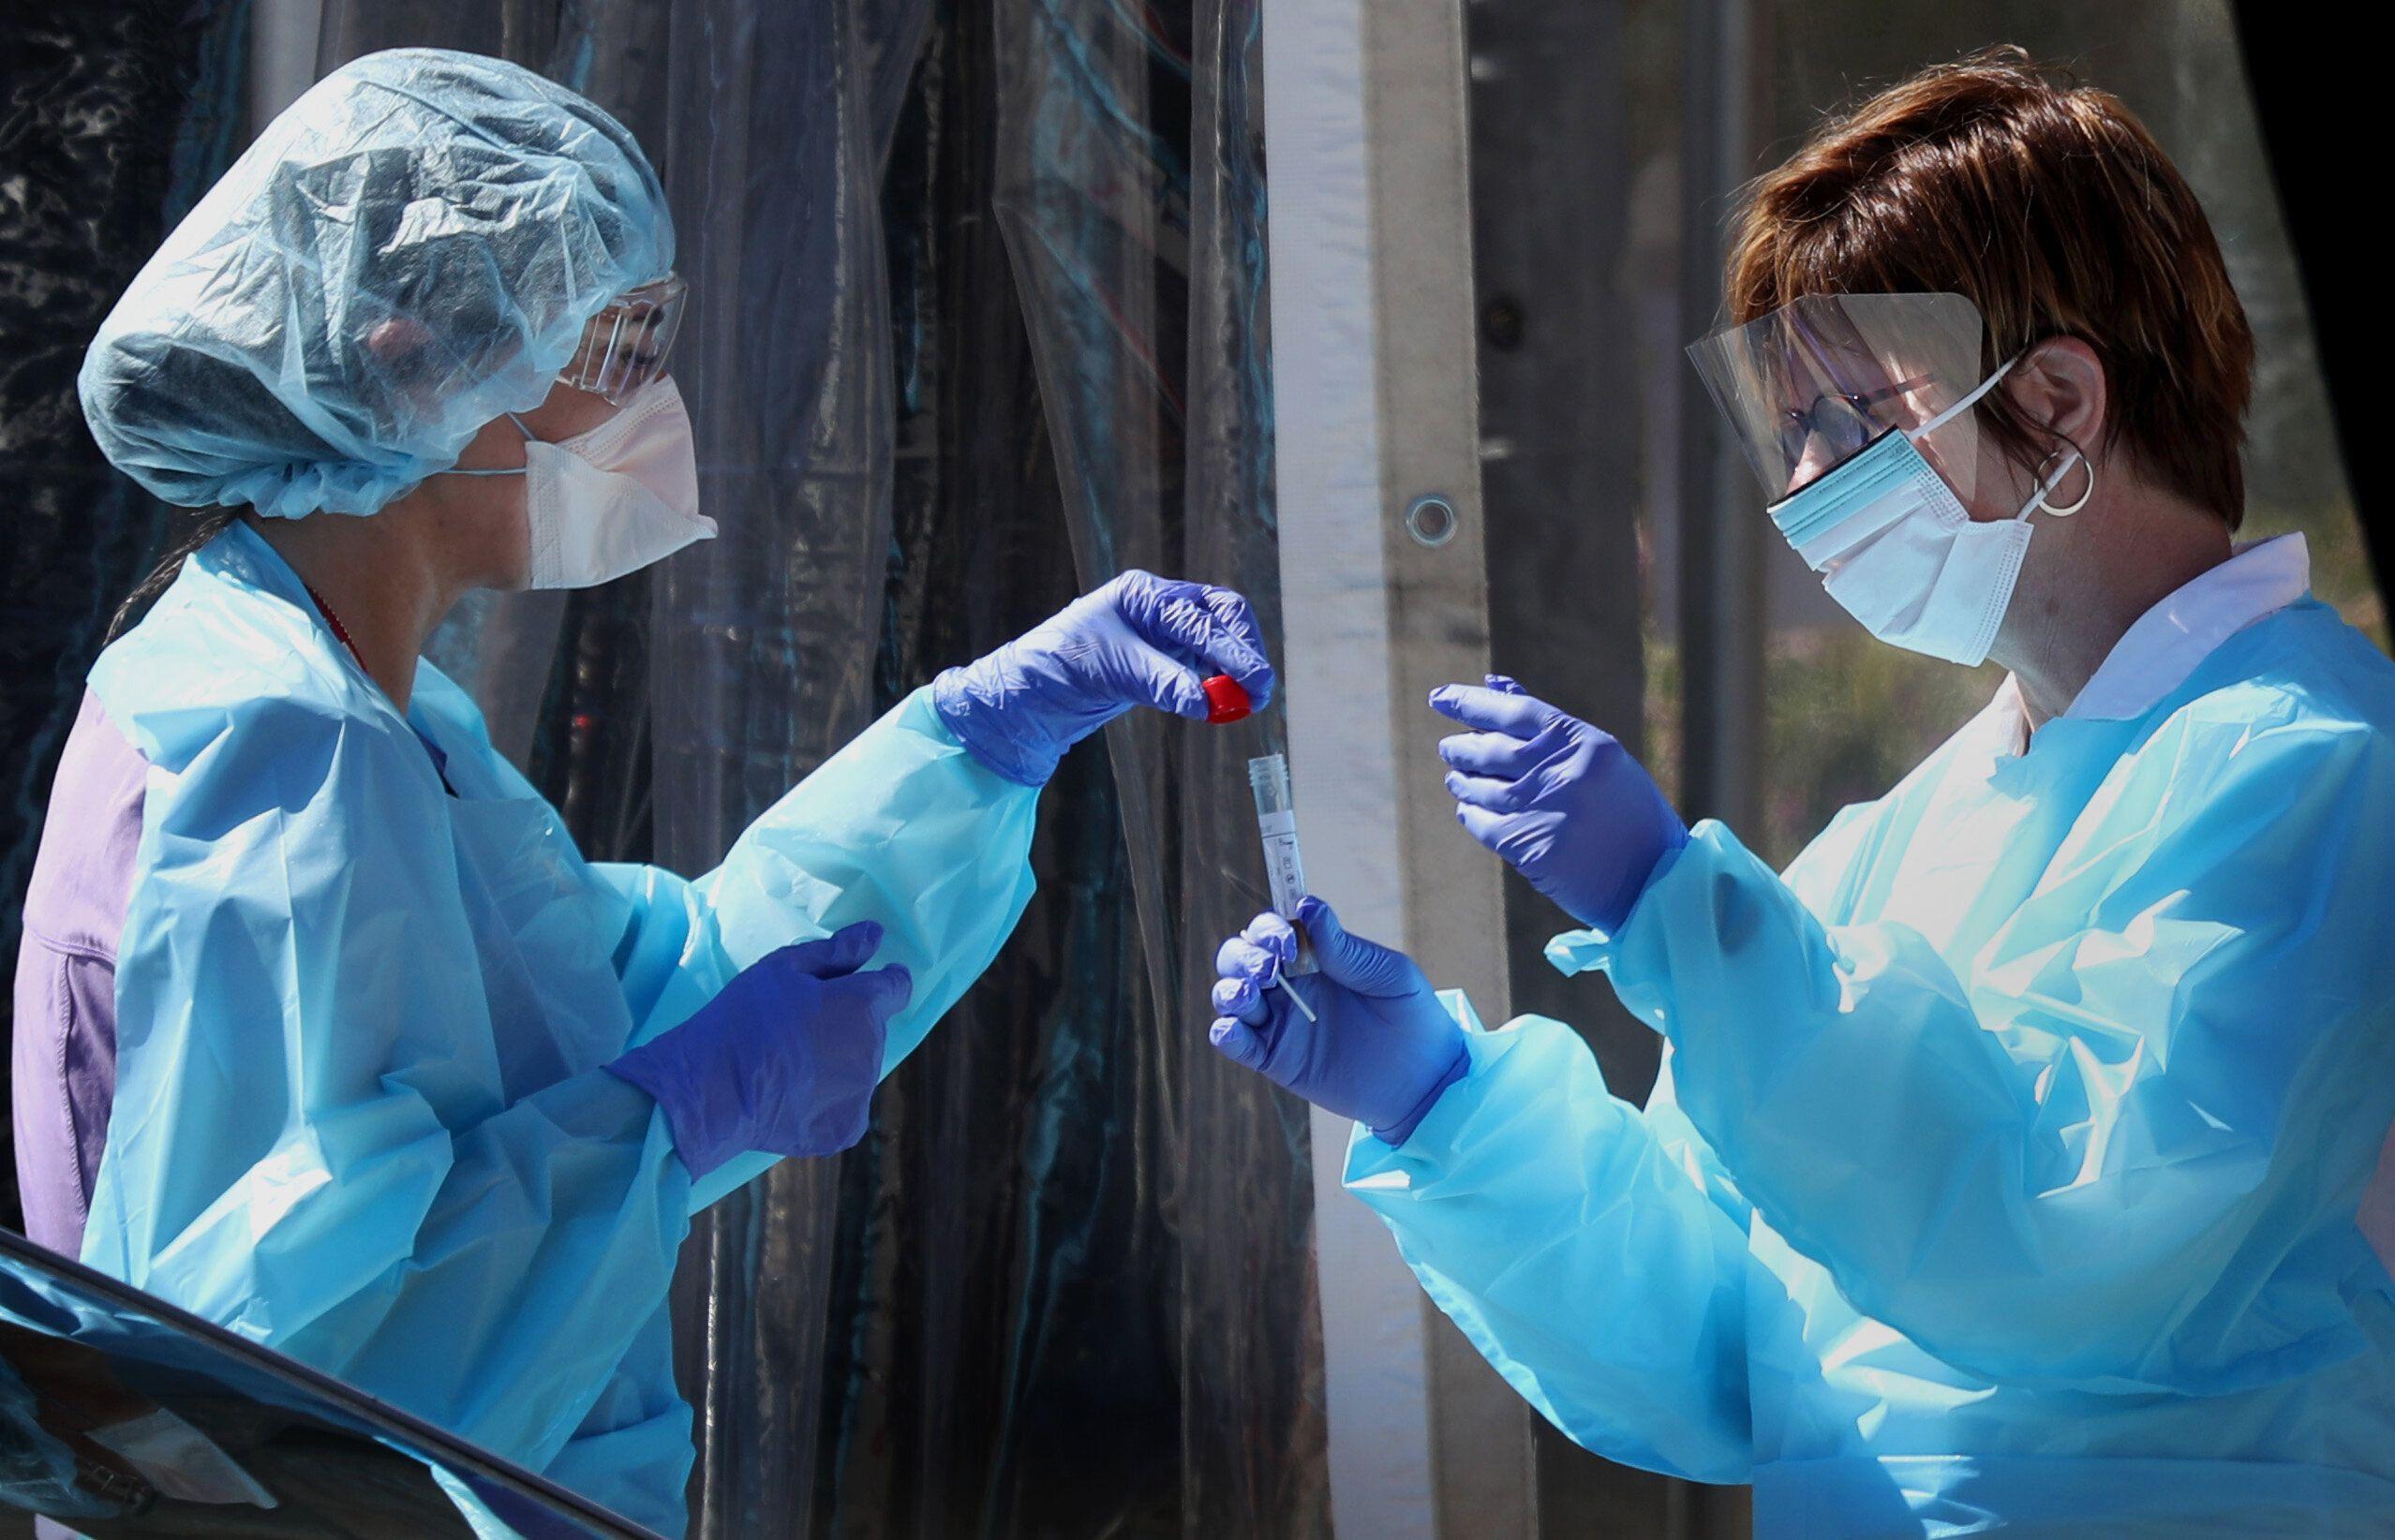 www.huffpost.com: Coronavirus: The Latest News And Updates From HuffPost